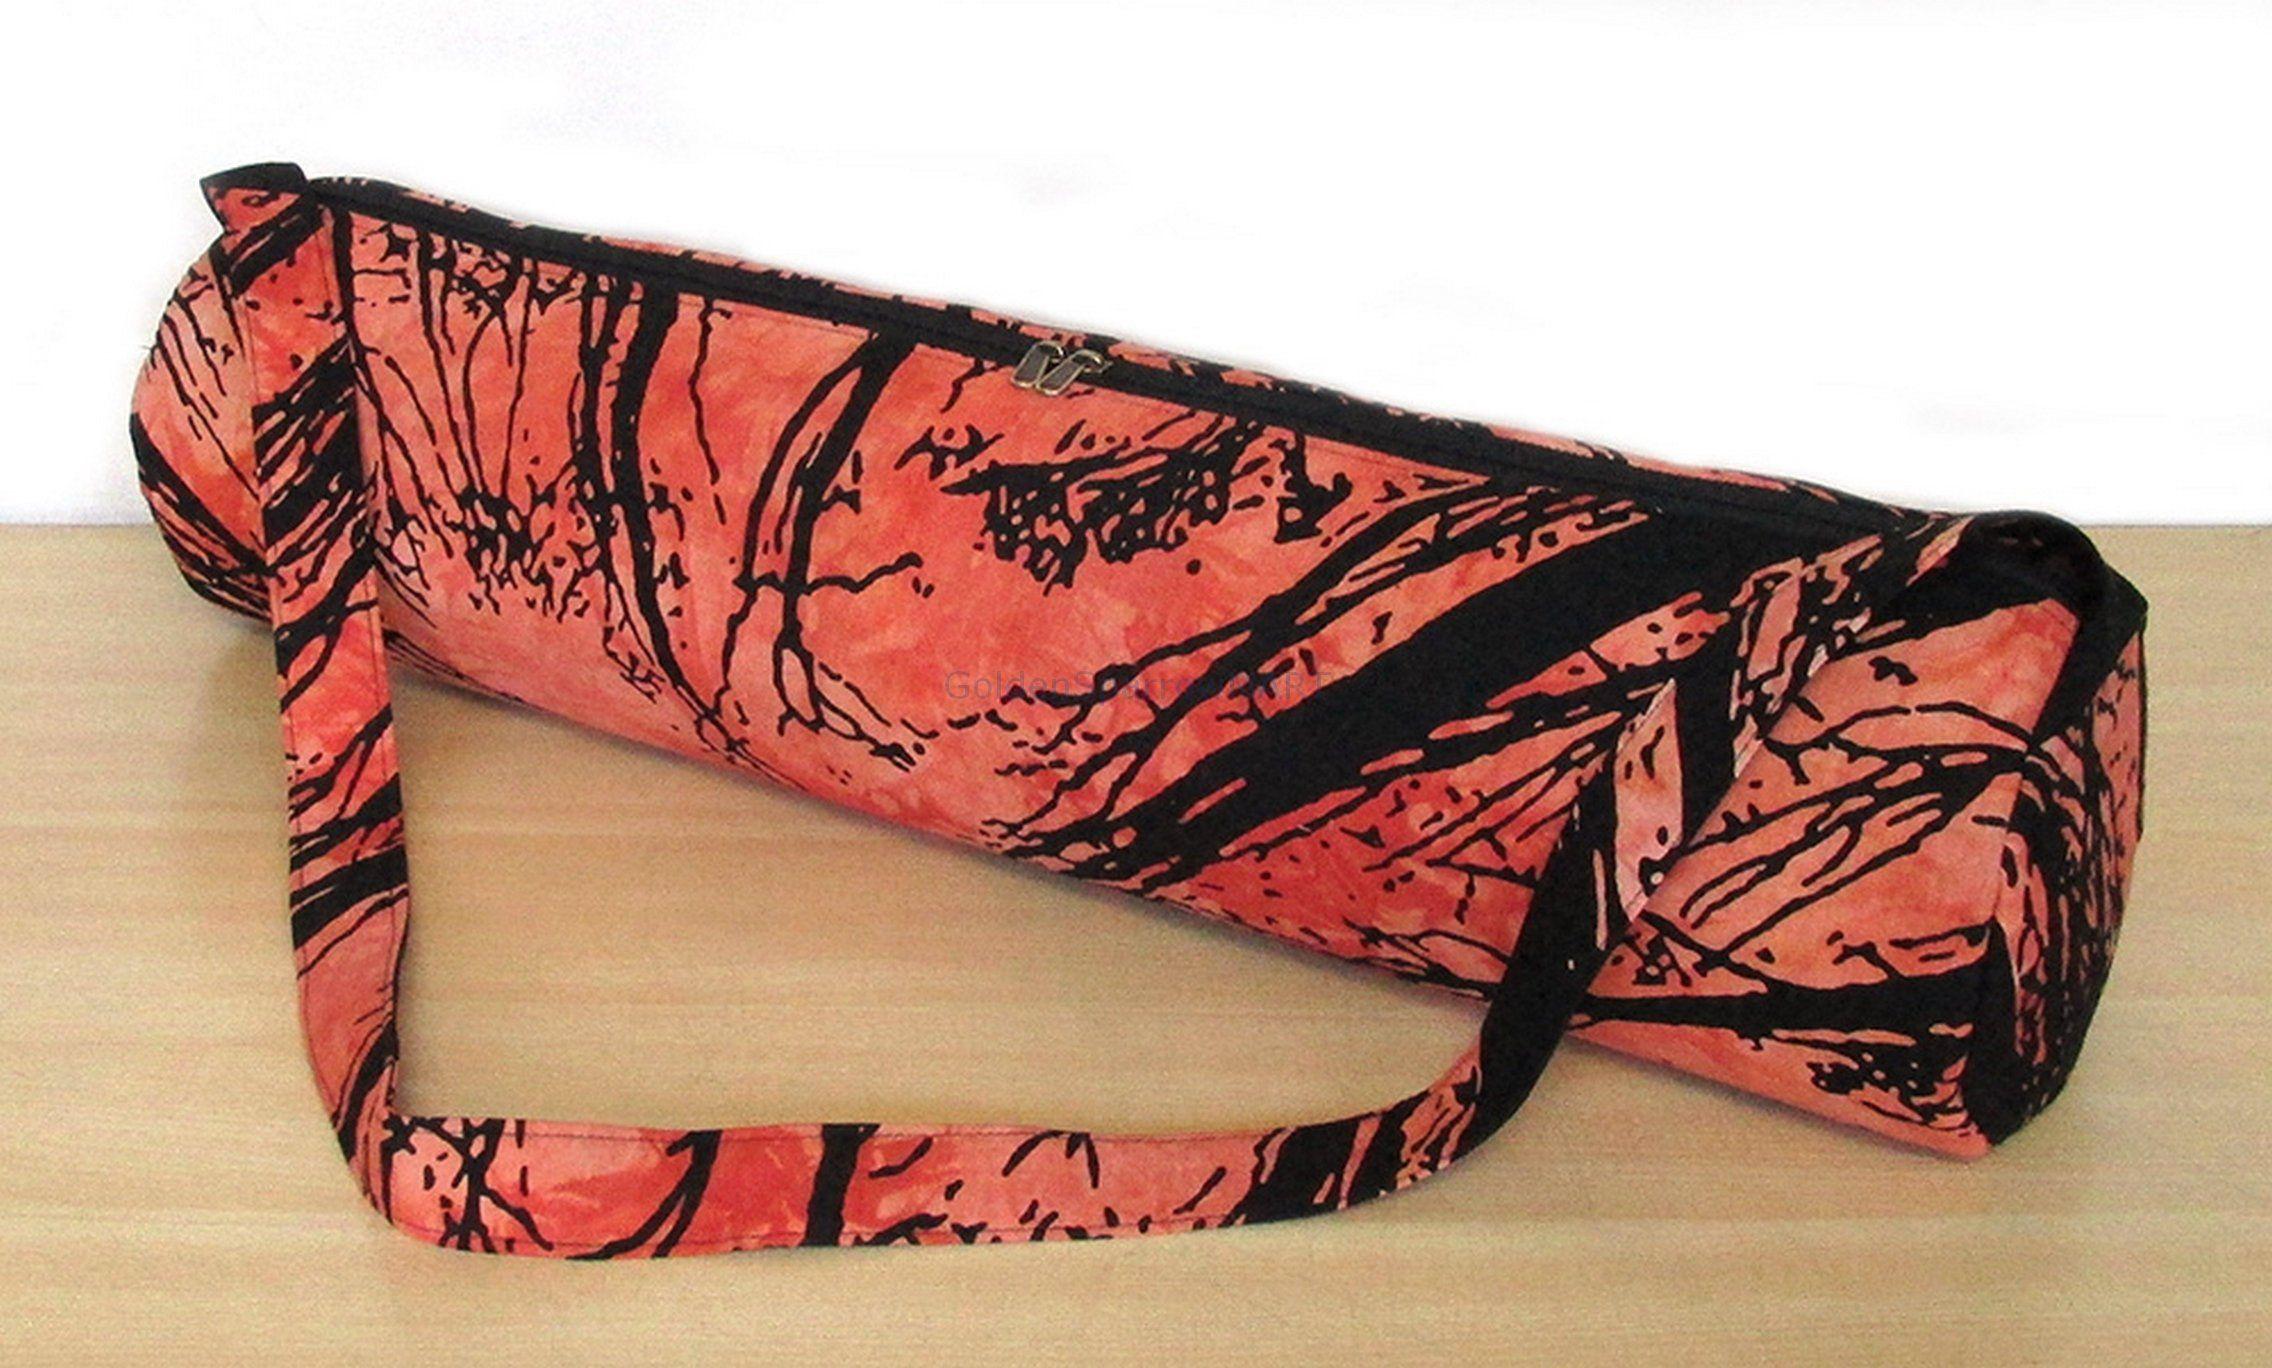 Etsy Shop New Astrology Indian Mandala Handmade Cotton Yoga Mat Bag Carry Beach Bags Hippie Gym Mat Carrier Sports Bags With Should Yoga Mat Bag Mat Bag Bags